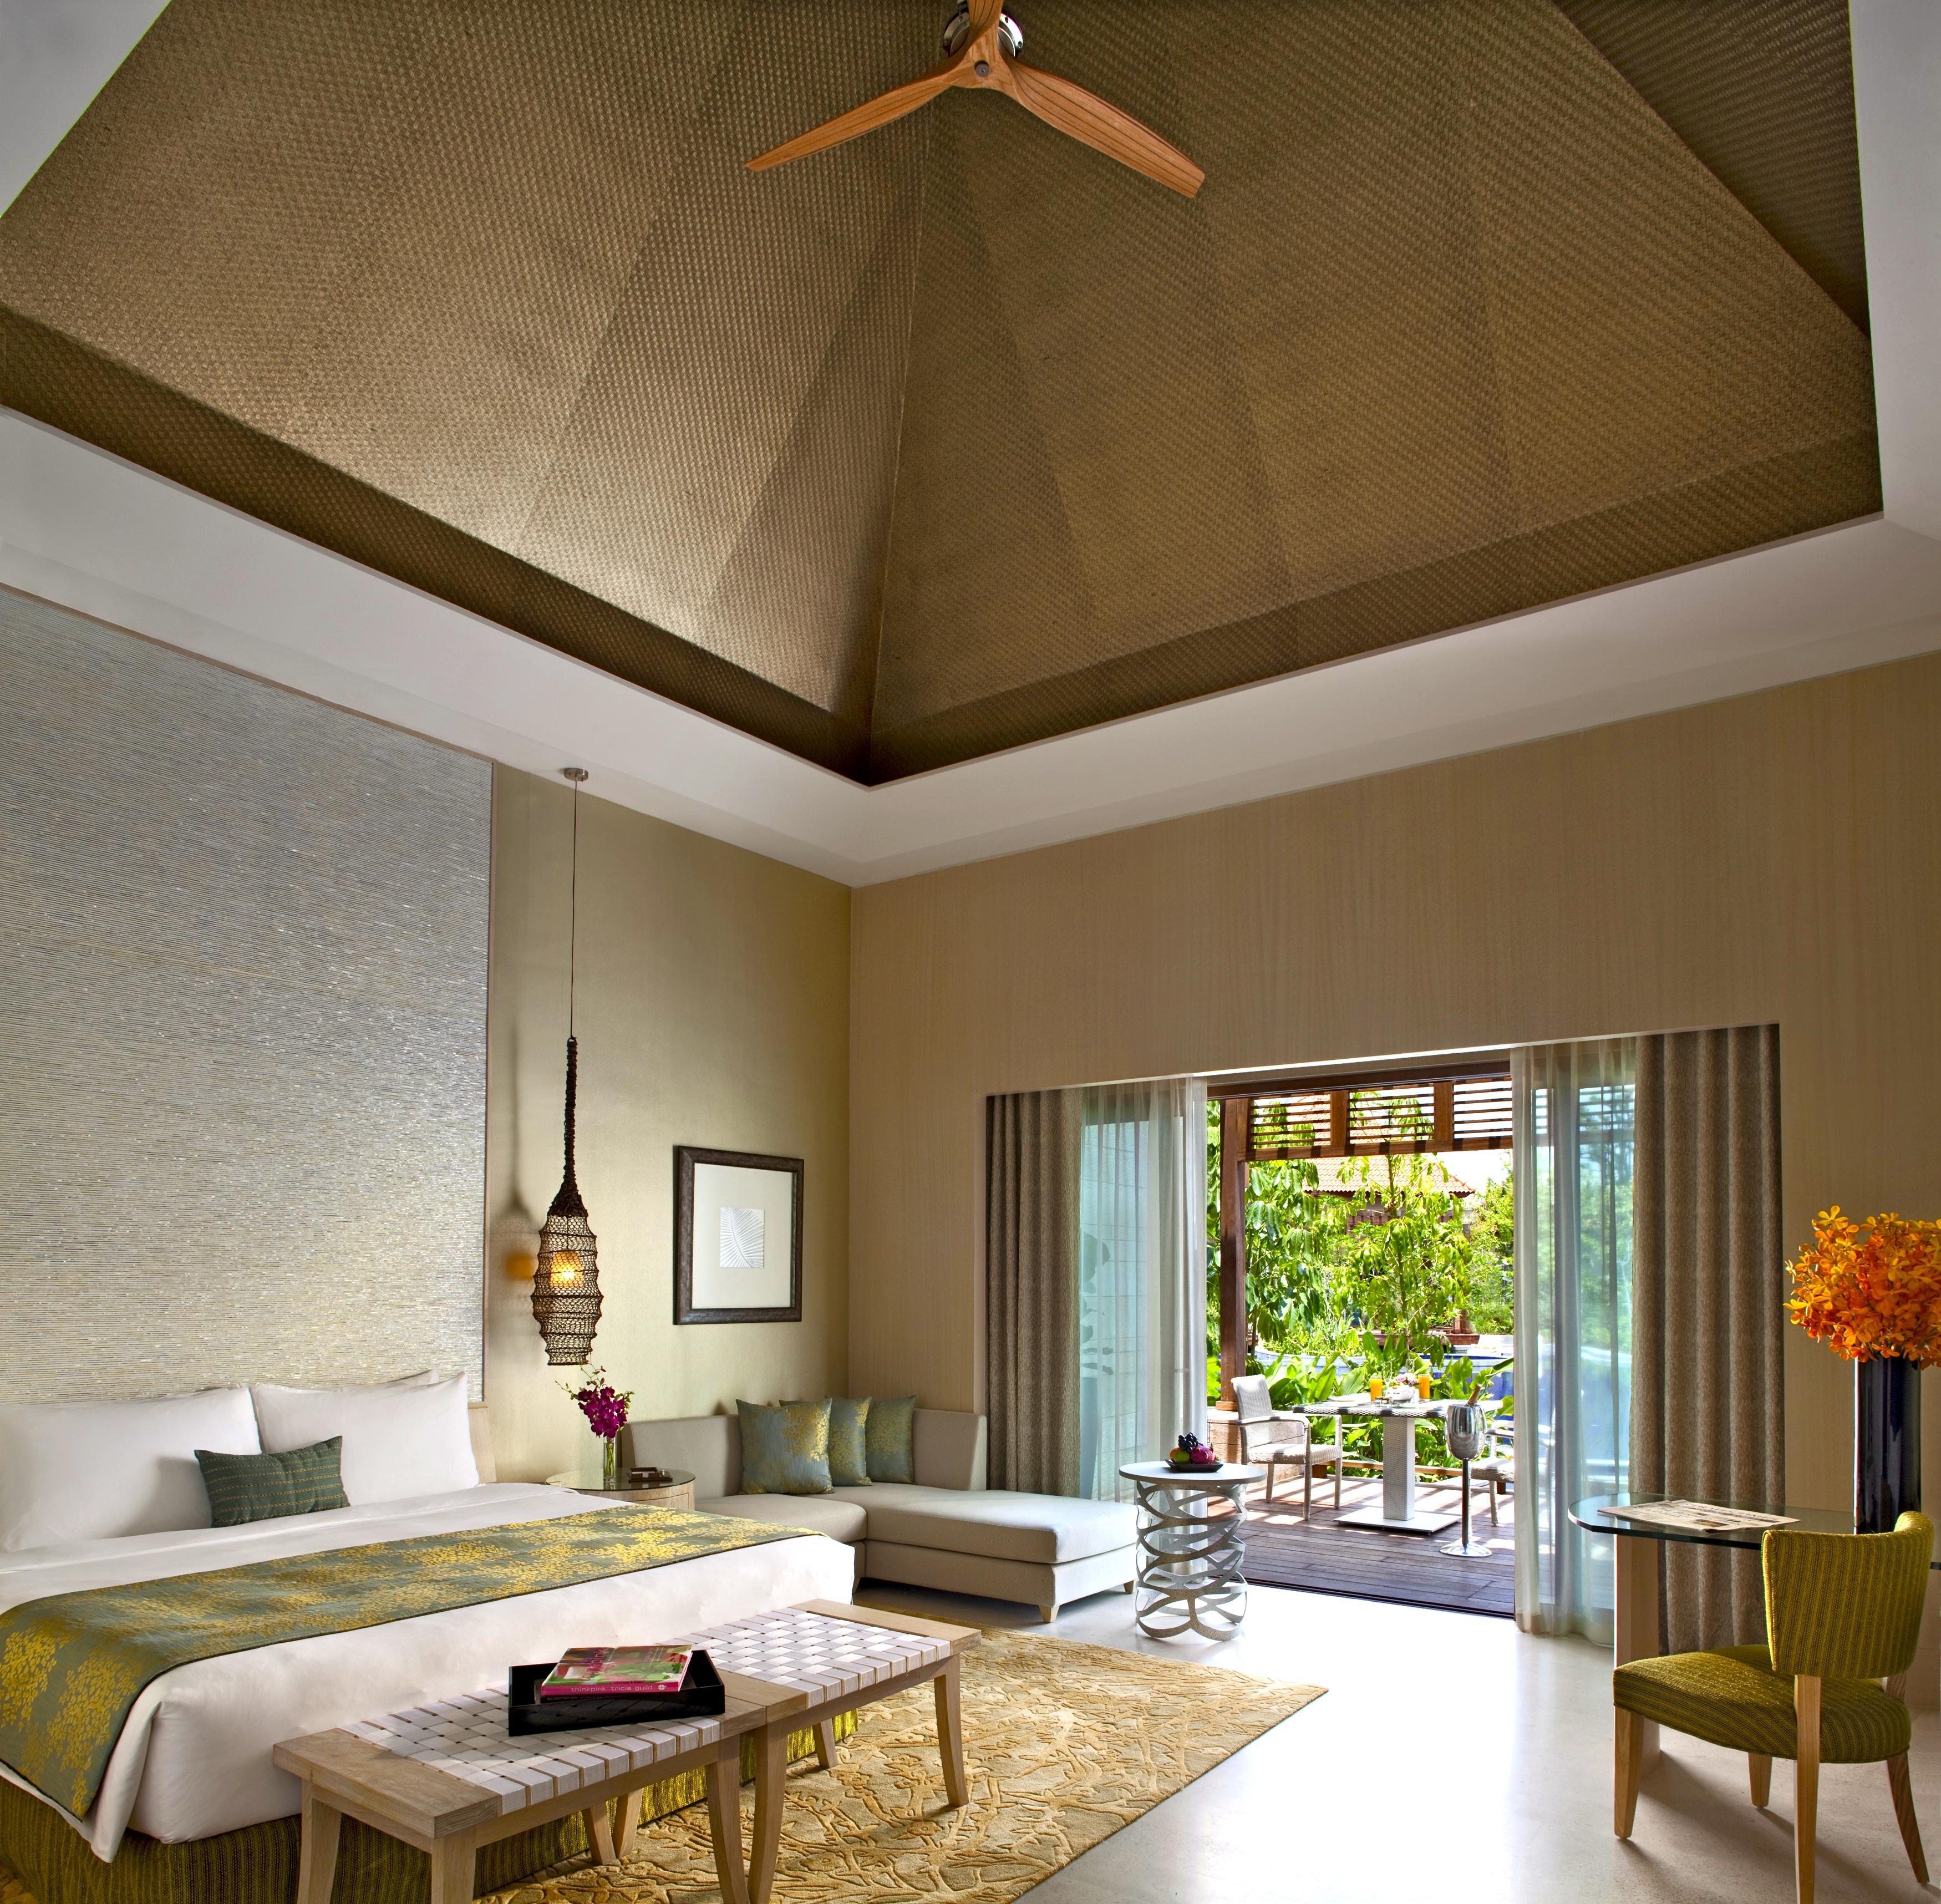 Tropical Luxury Hotel Bedroom : Tropical Luxury Hotel Bedroom Sentosa singapore hotel